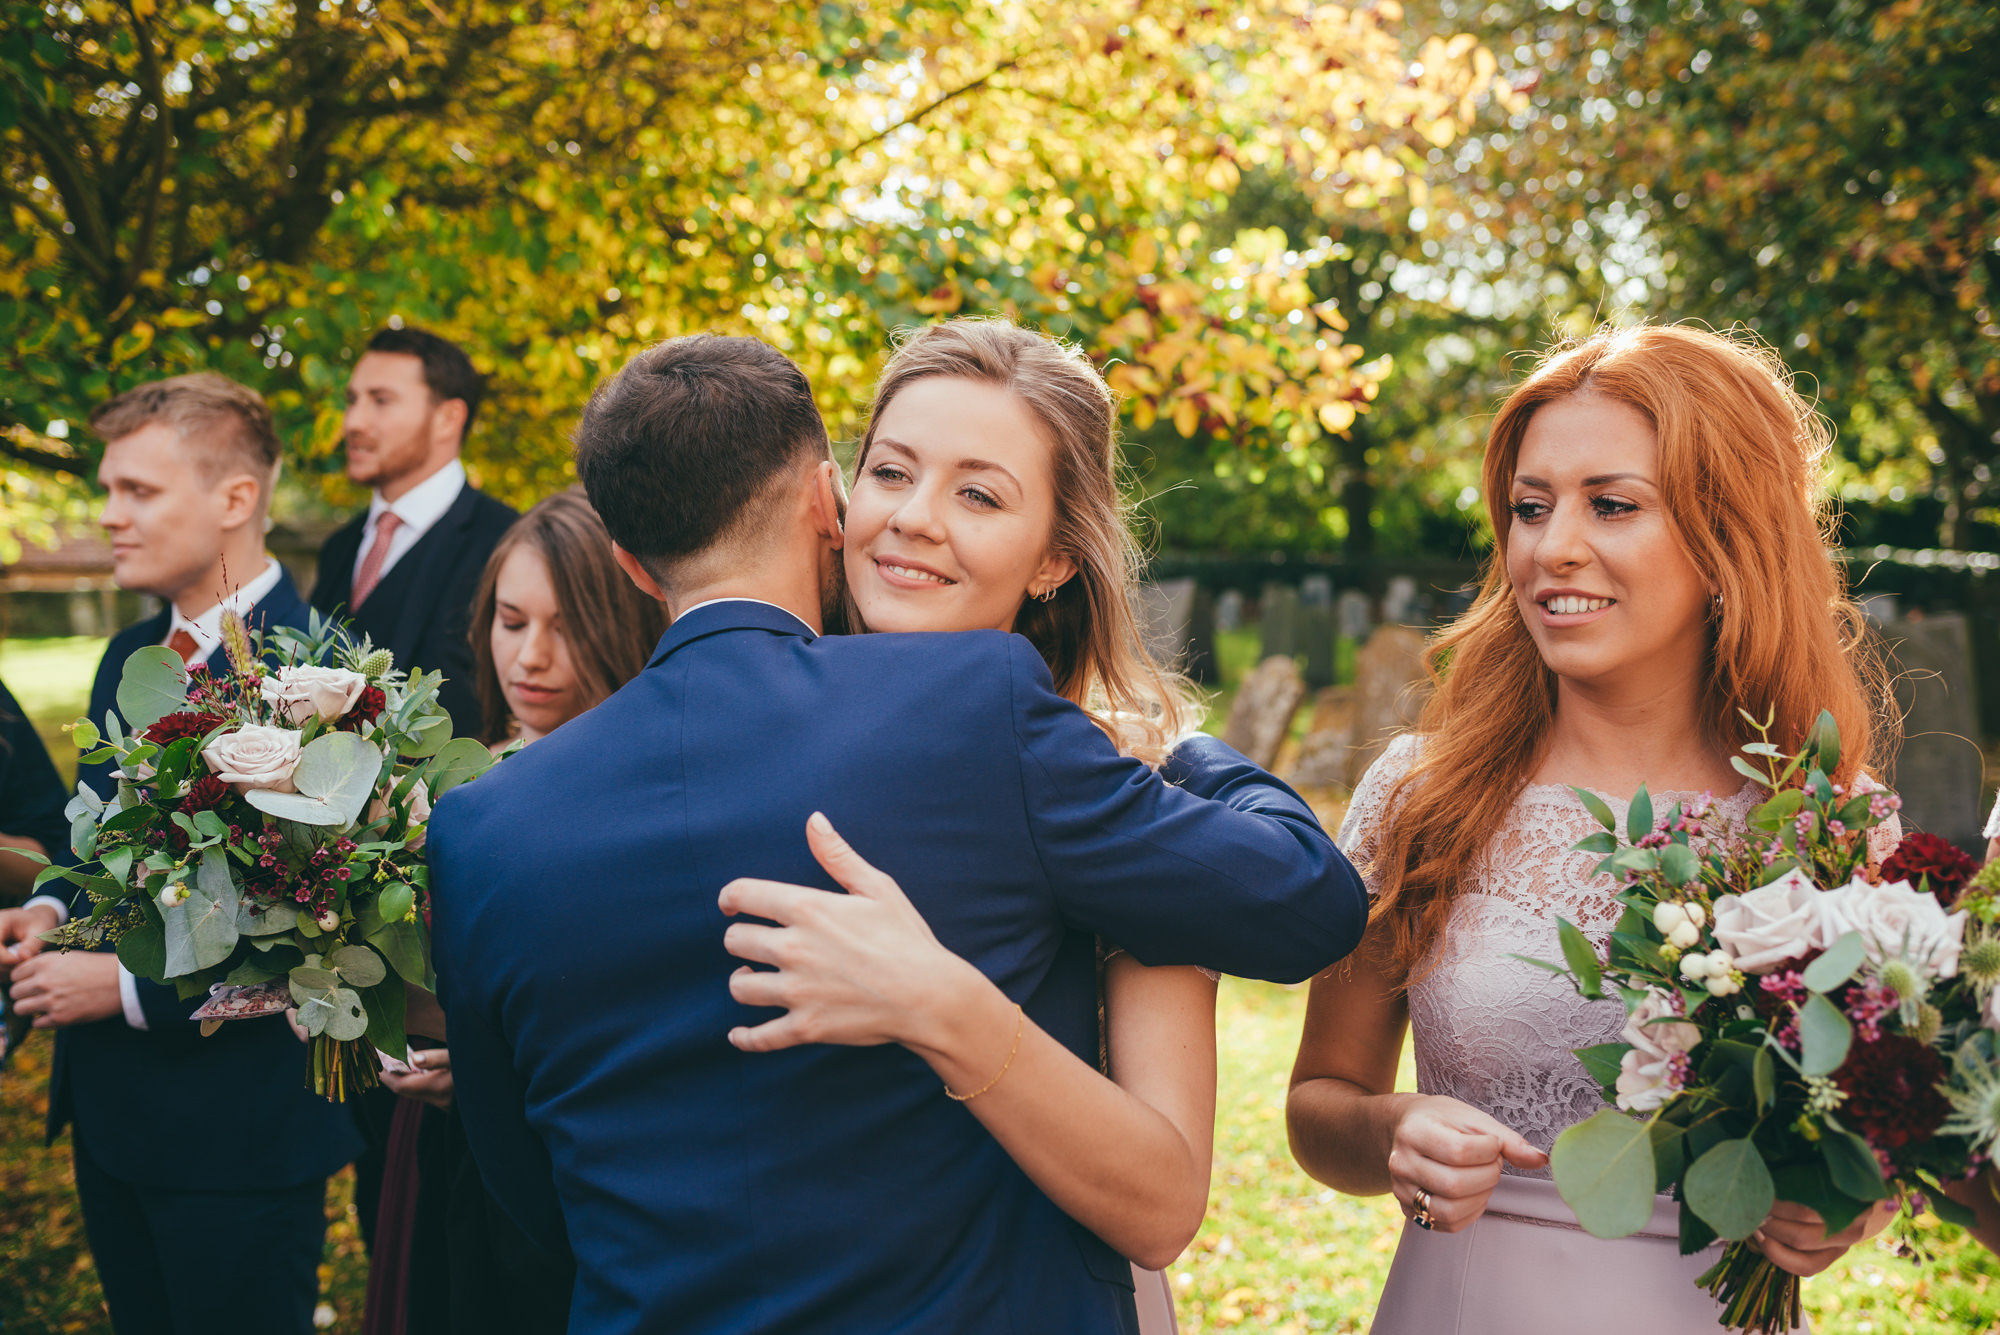 bridesmaid hugging her friend